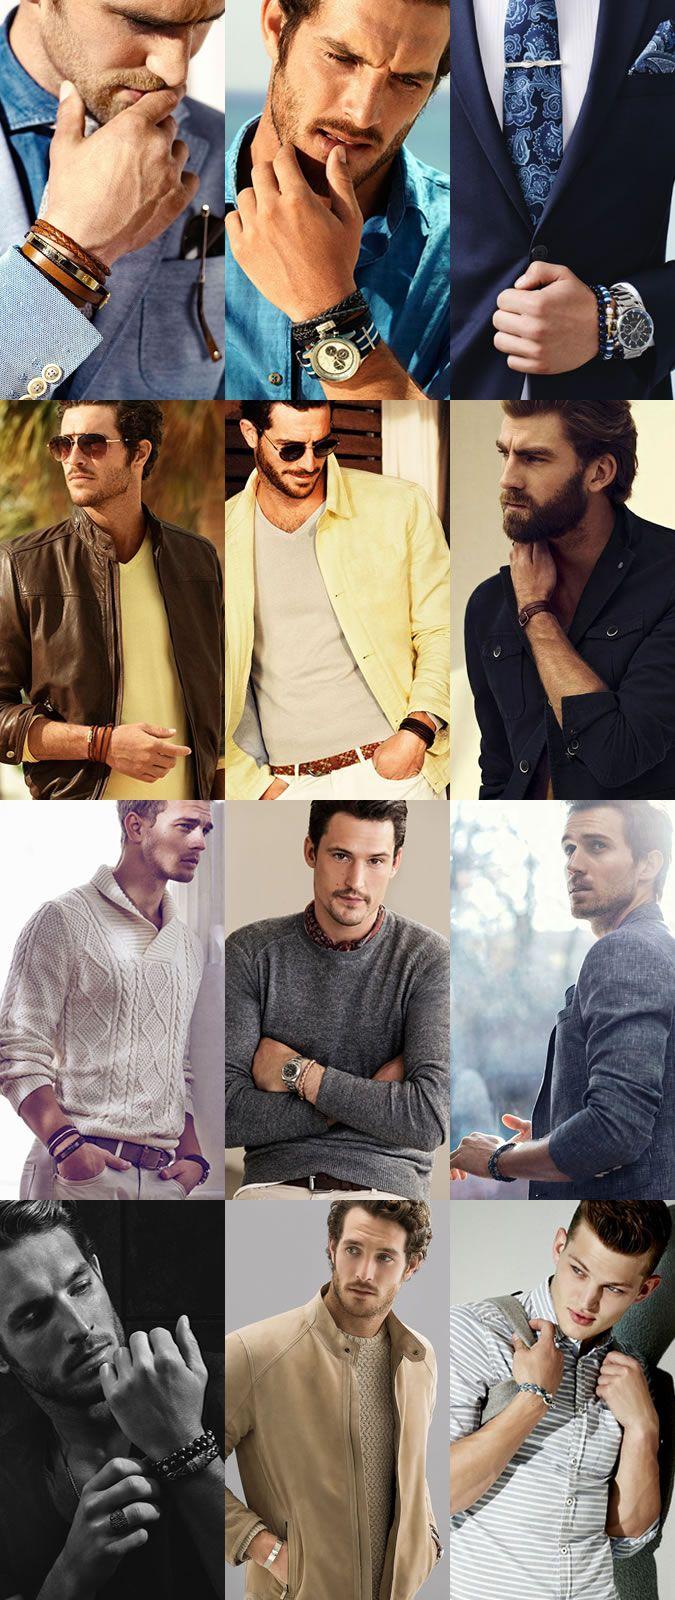 Men's Jewellery for 2015 Spring/Summer : Bracelets & Cuffs Lookbook Inspiration